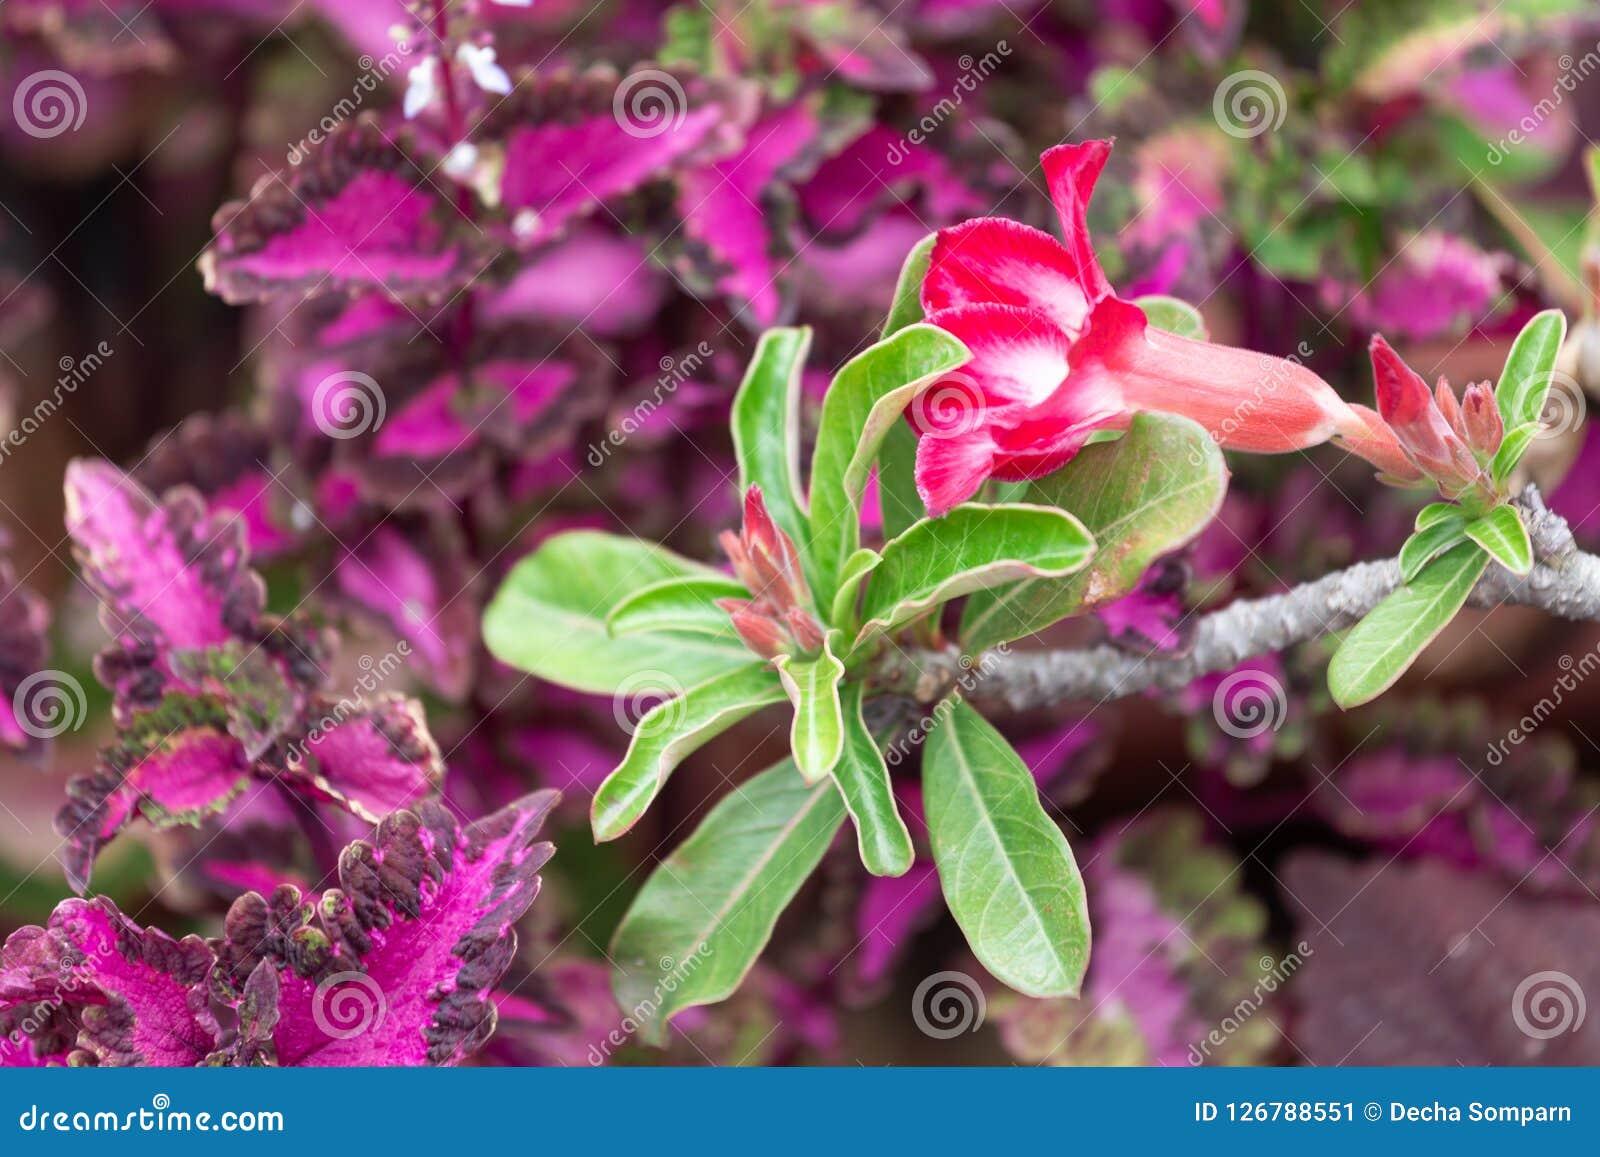 Beautiful flower in garden stock image image of bokeh flora beautiful flower in garden izmirmasajfo